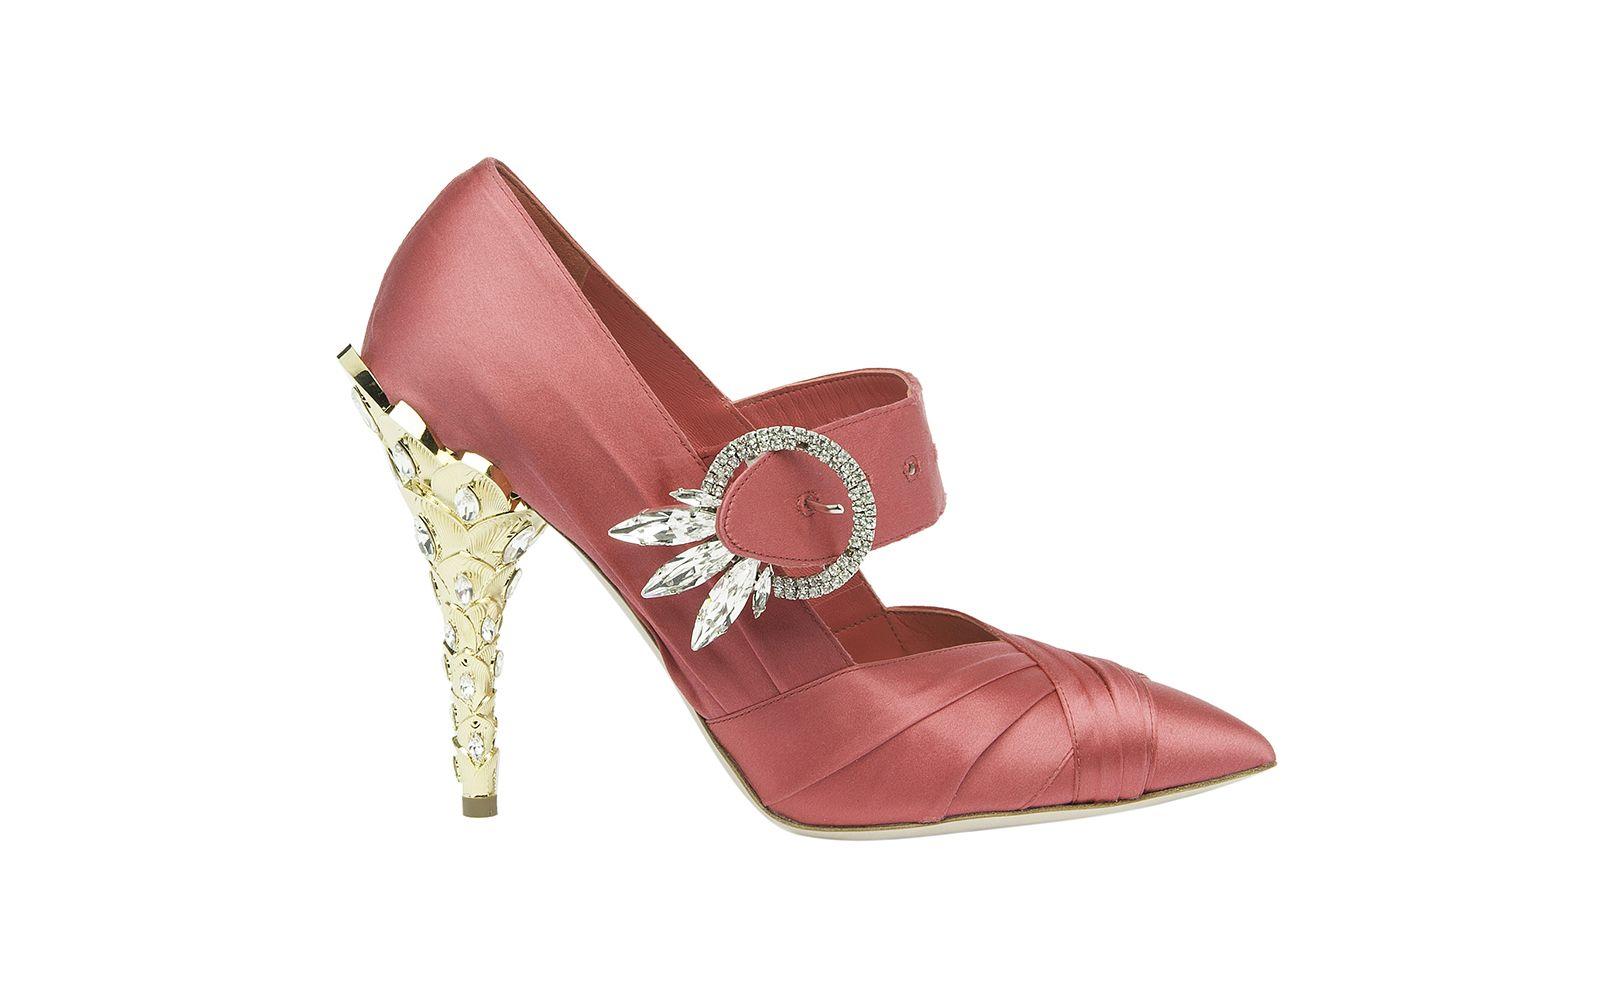 Miu Miu silk heels in pink (Photo: Courtesy of Miu Miu)